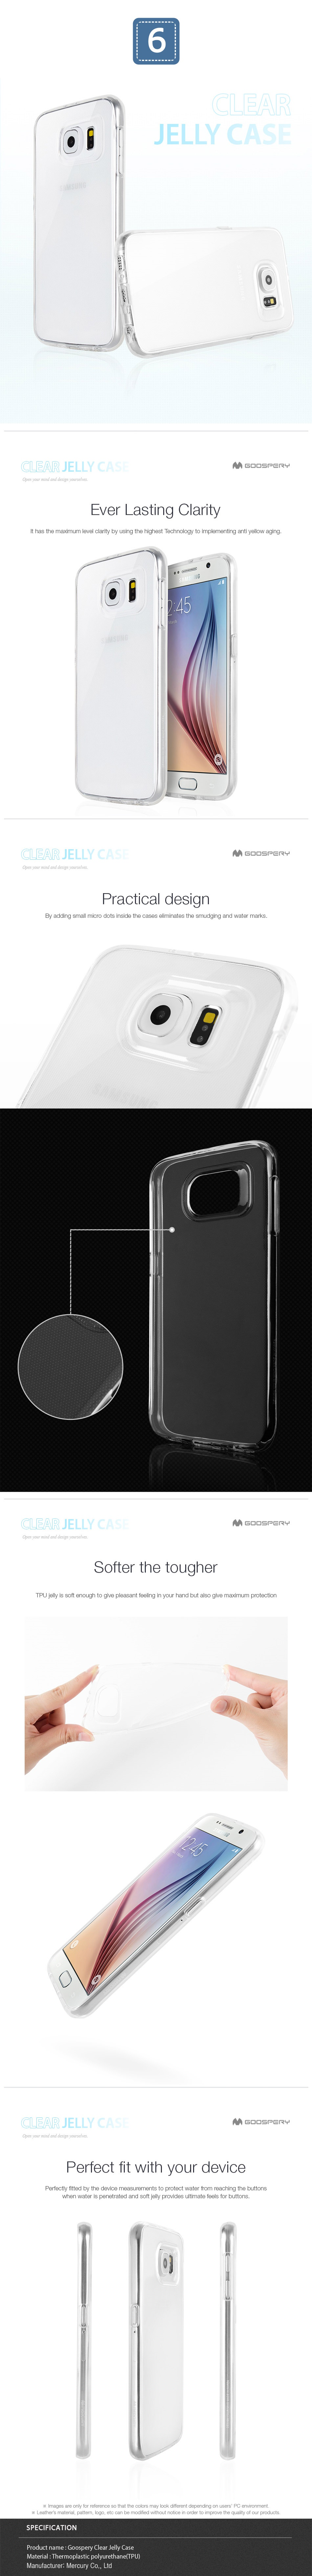 Buy Jdpremium Designer Stylegoospery Case Cover For Iphone Samsung Goospery Xiaomi Note 4 4x Canvas Diary Blue 07 Fancy